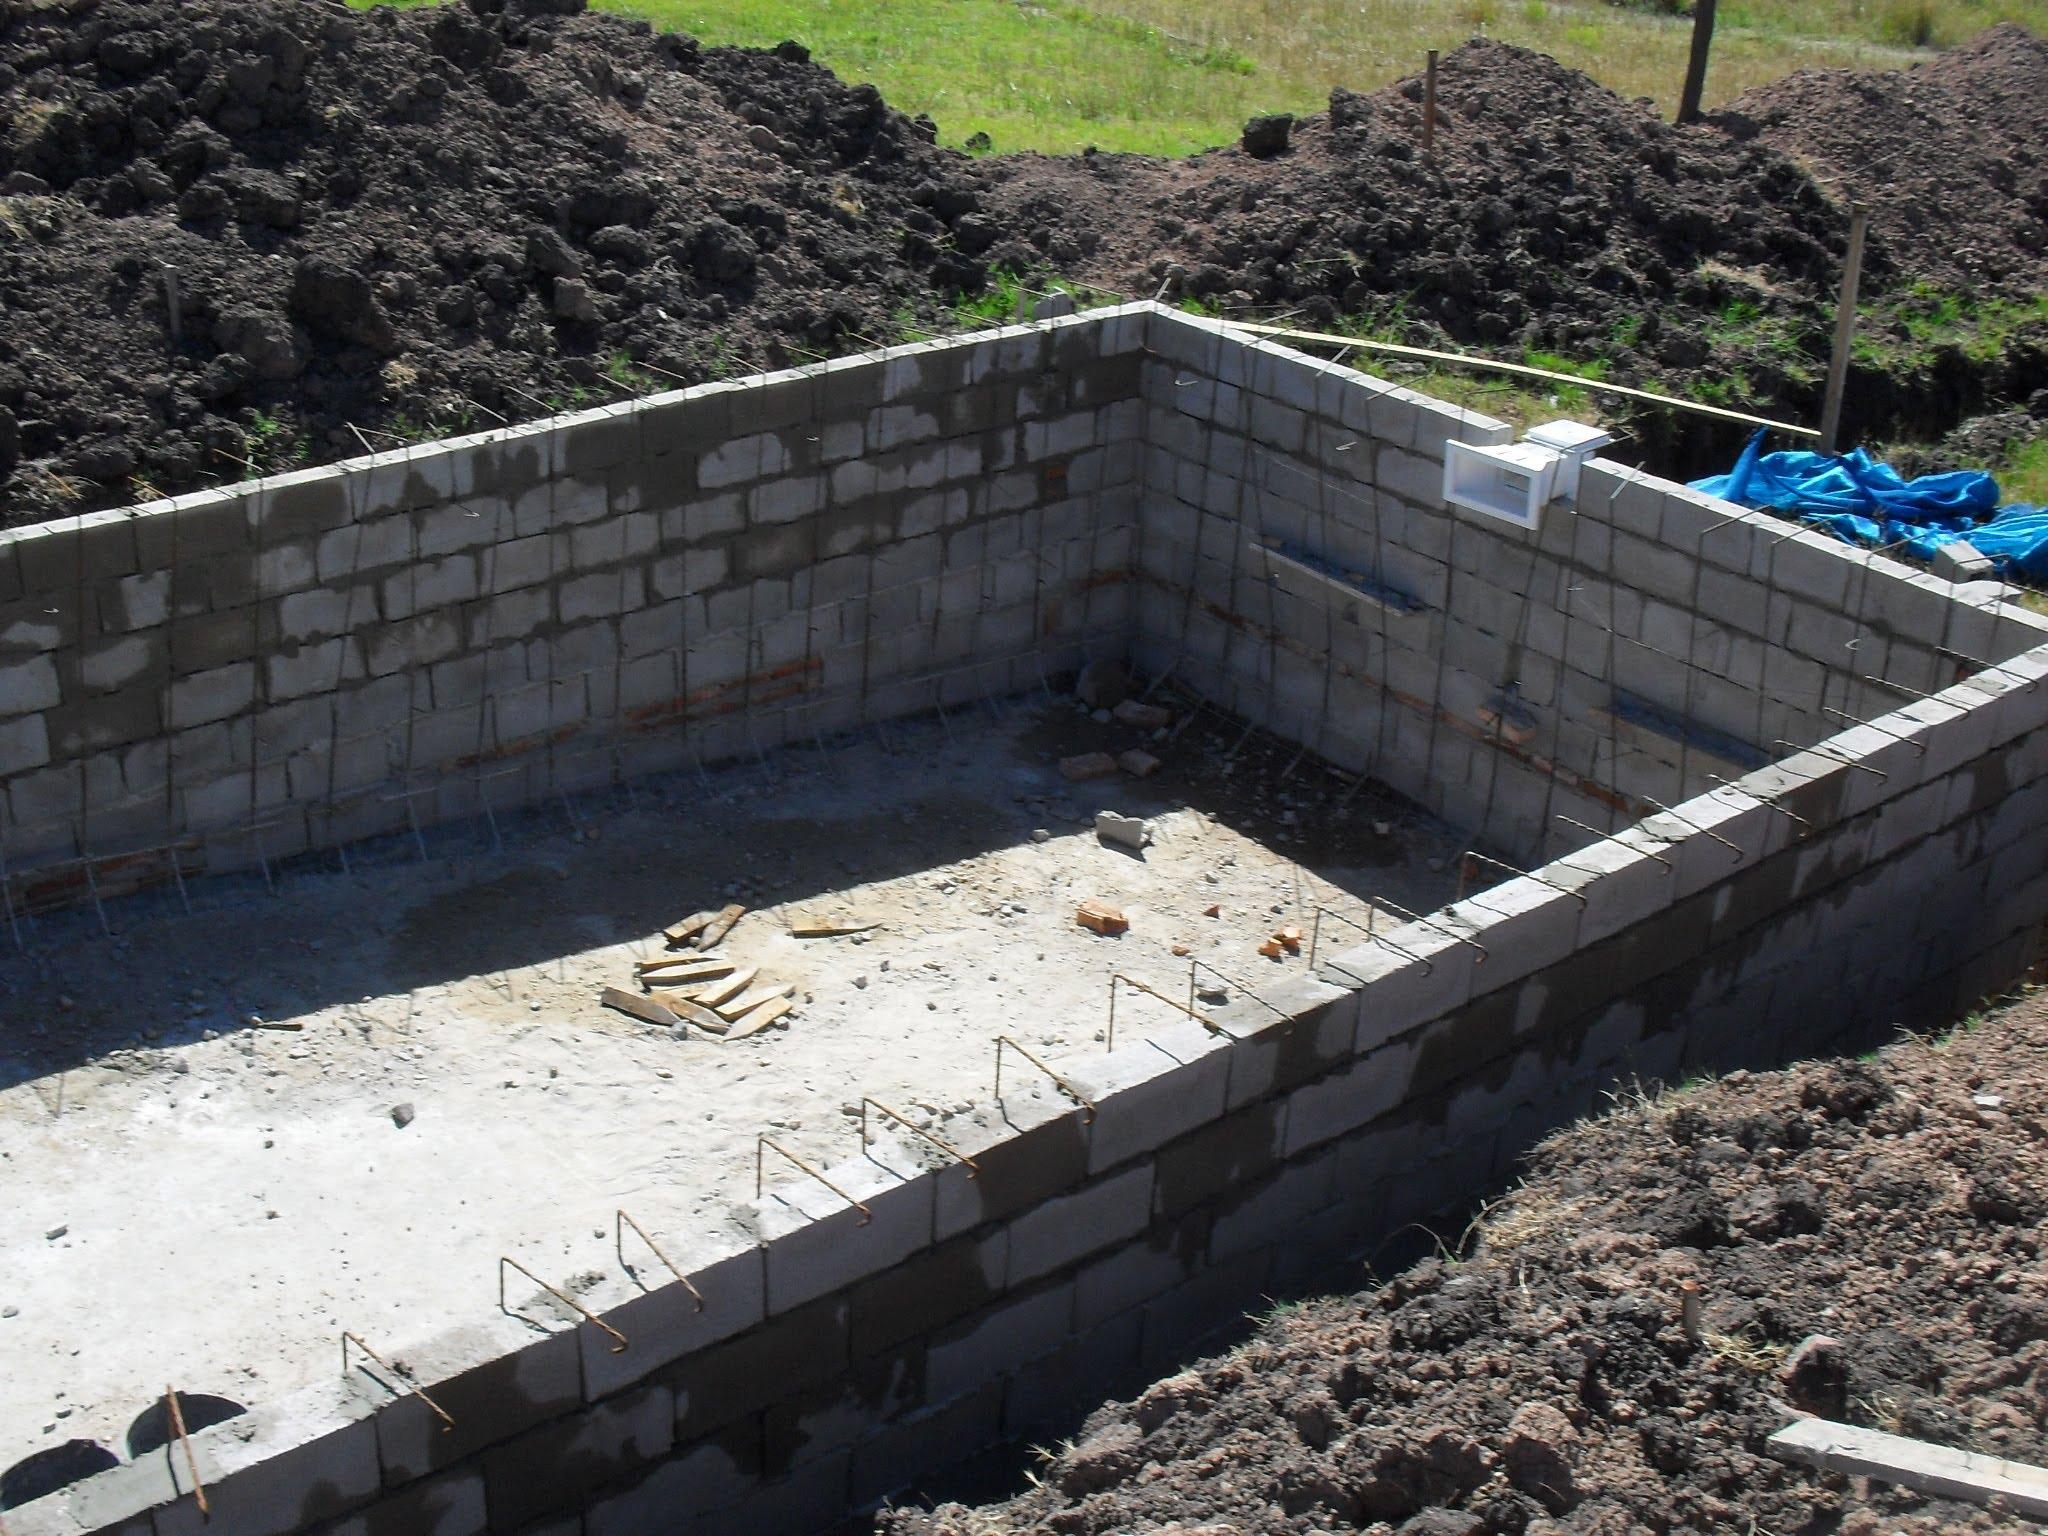 Como hacer una piscina de cemento paso a paso sencillo for Fabricacion de piscinas